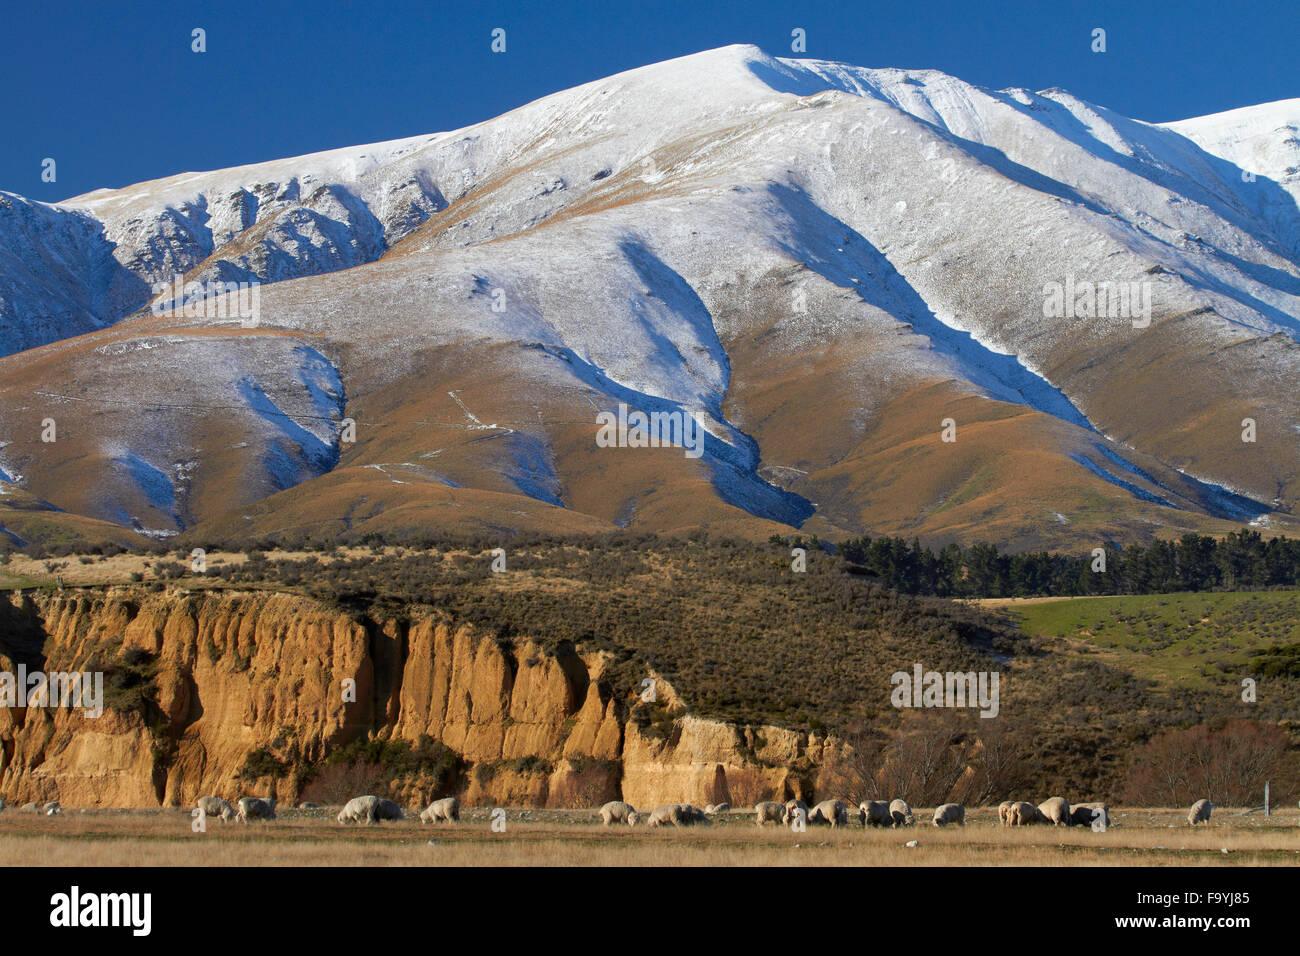 Sheep and Kakanui Mountains, Maniototo, Central Otago, South Island, New Zealand - Stock Image